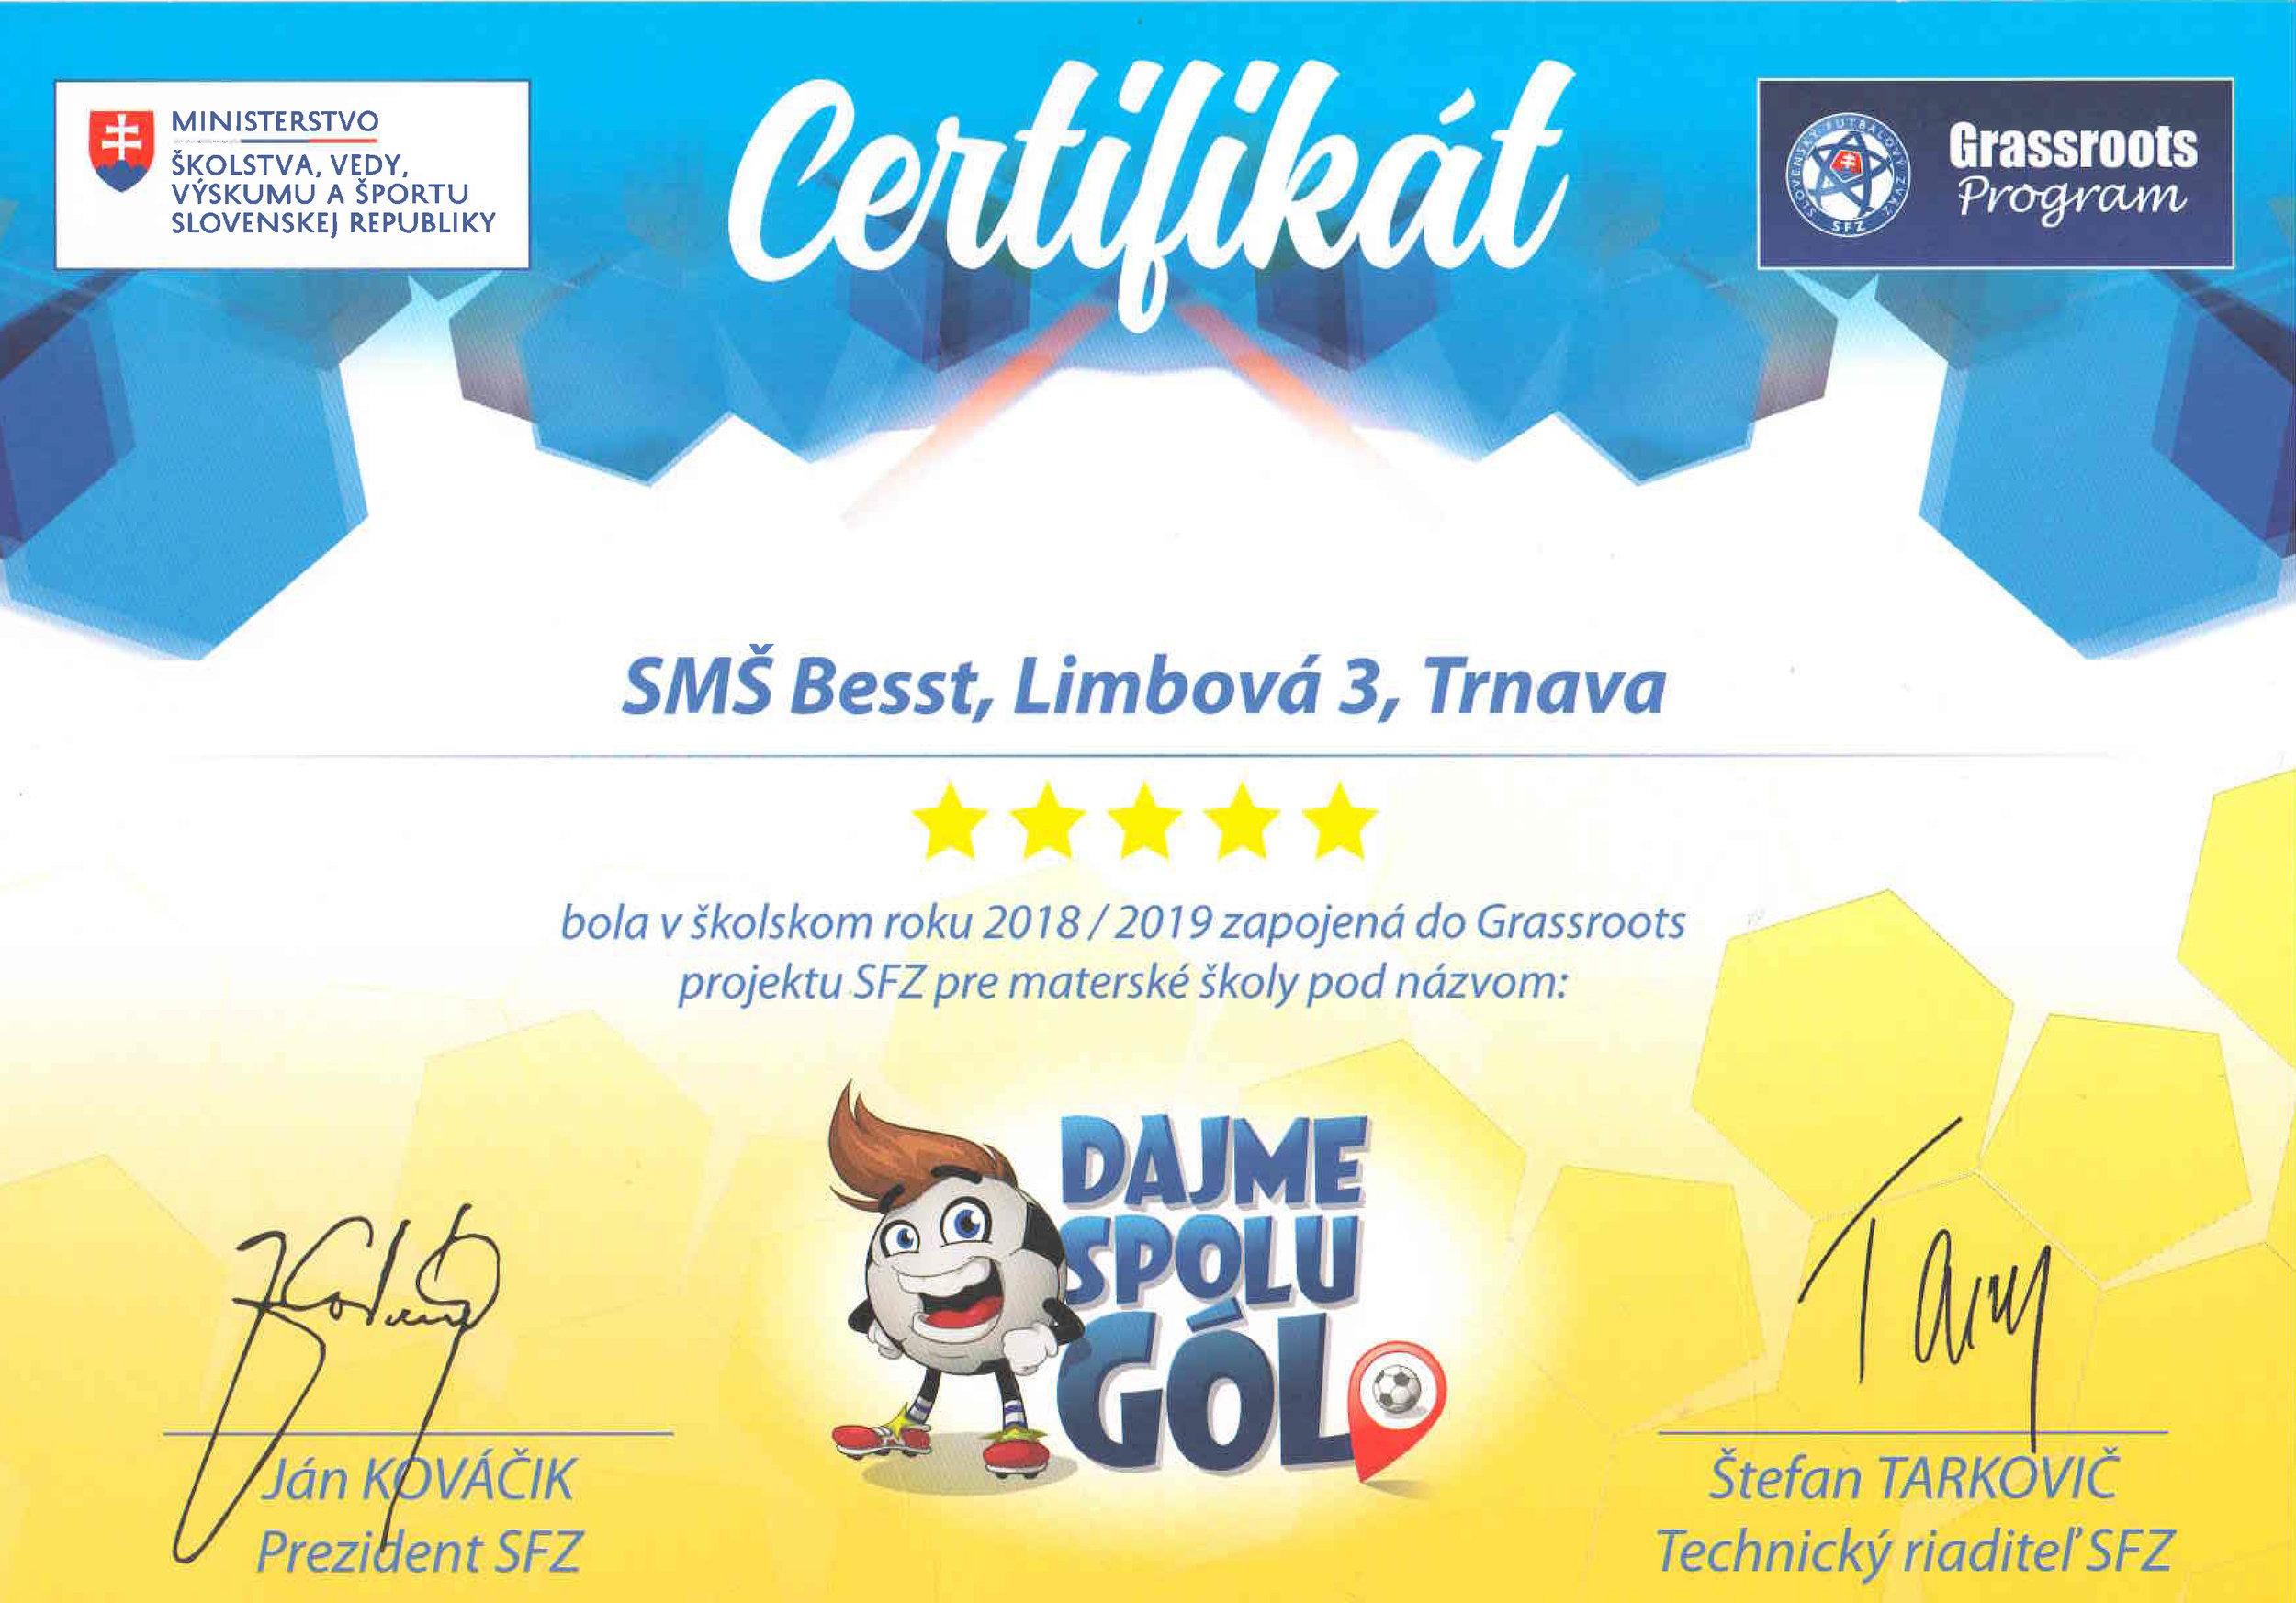 Certifikát smš-01.jpg